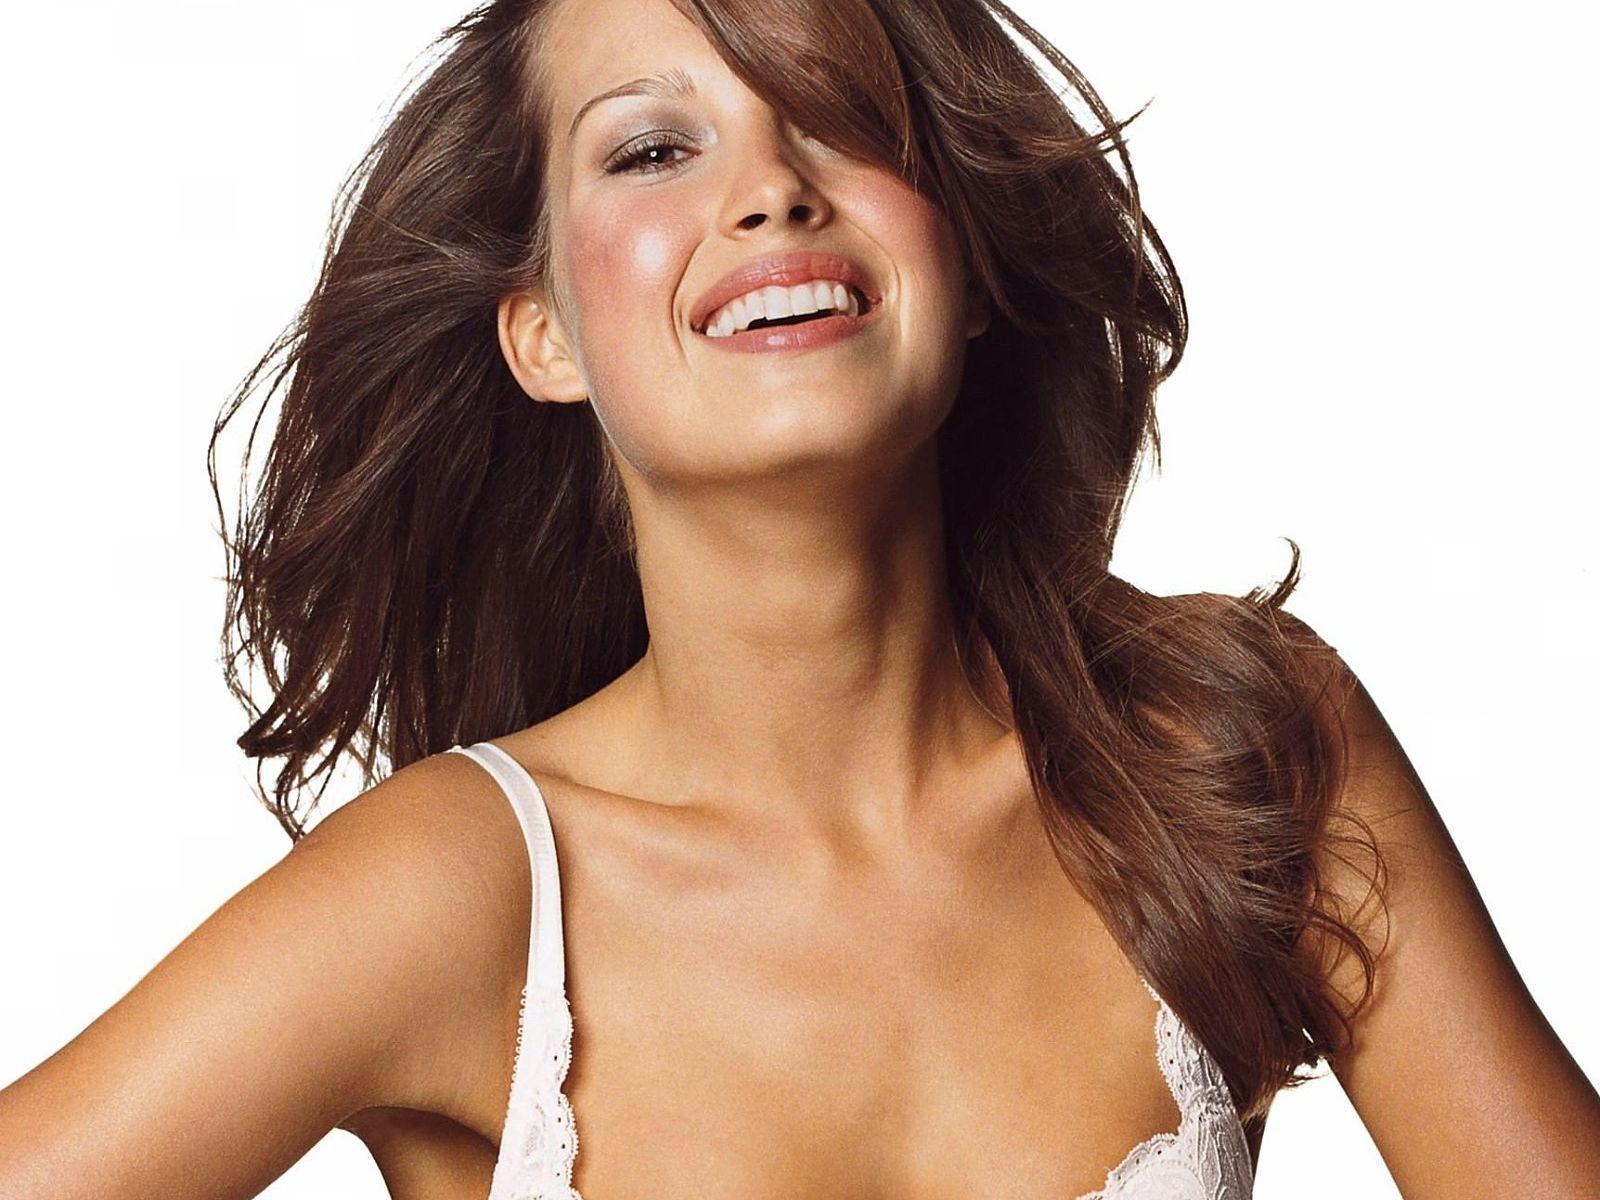 http://4.bp.blogspot.com/_Si7zjQmZnm4/SZxOZ8o2T3I/AAAAAAAACFI/302Gs_37bWU/s1600/Fullwalls.blogspot.com_Petra_Nemcova%286%29.jpg